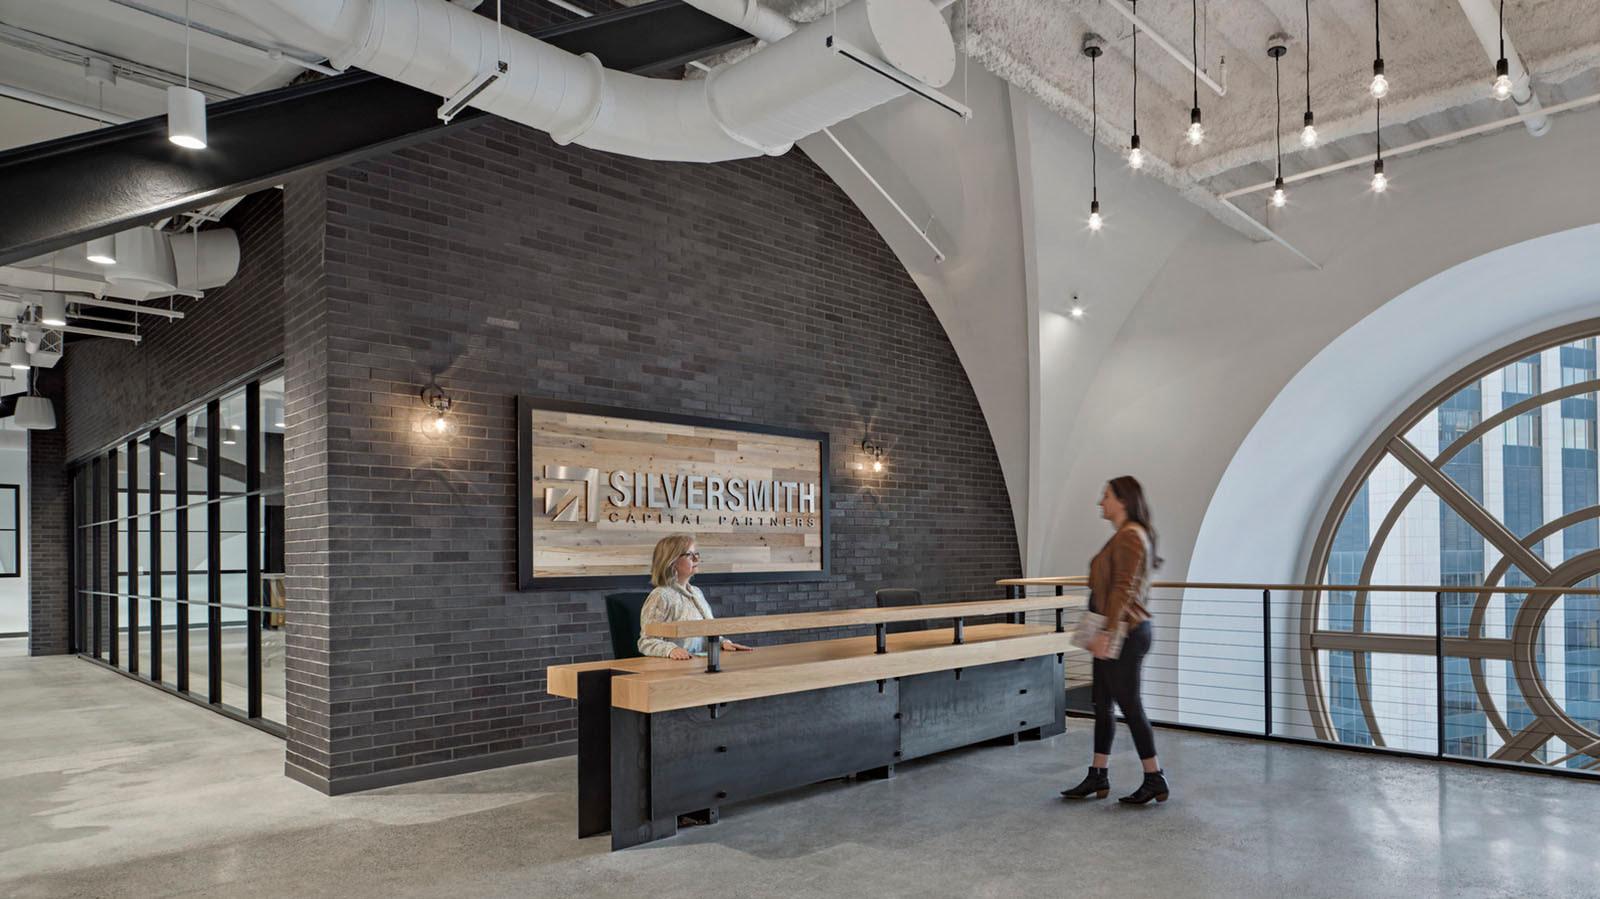 Silversmith Reception Area